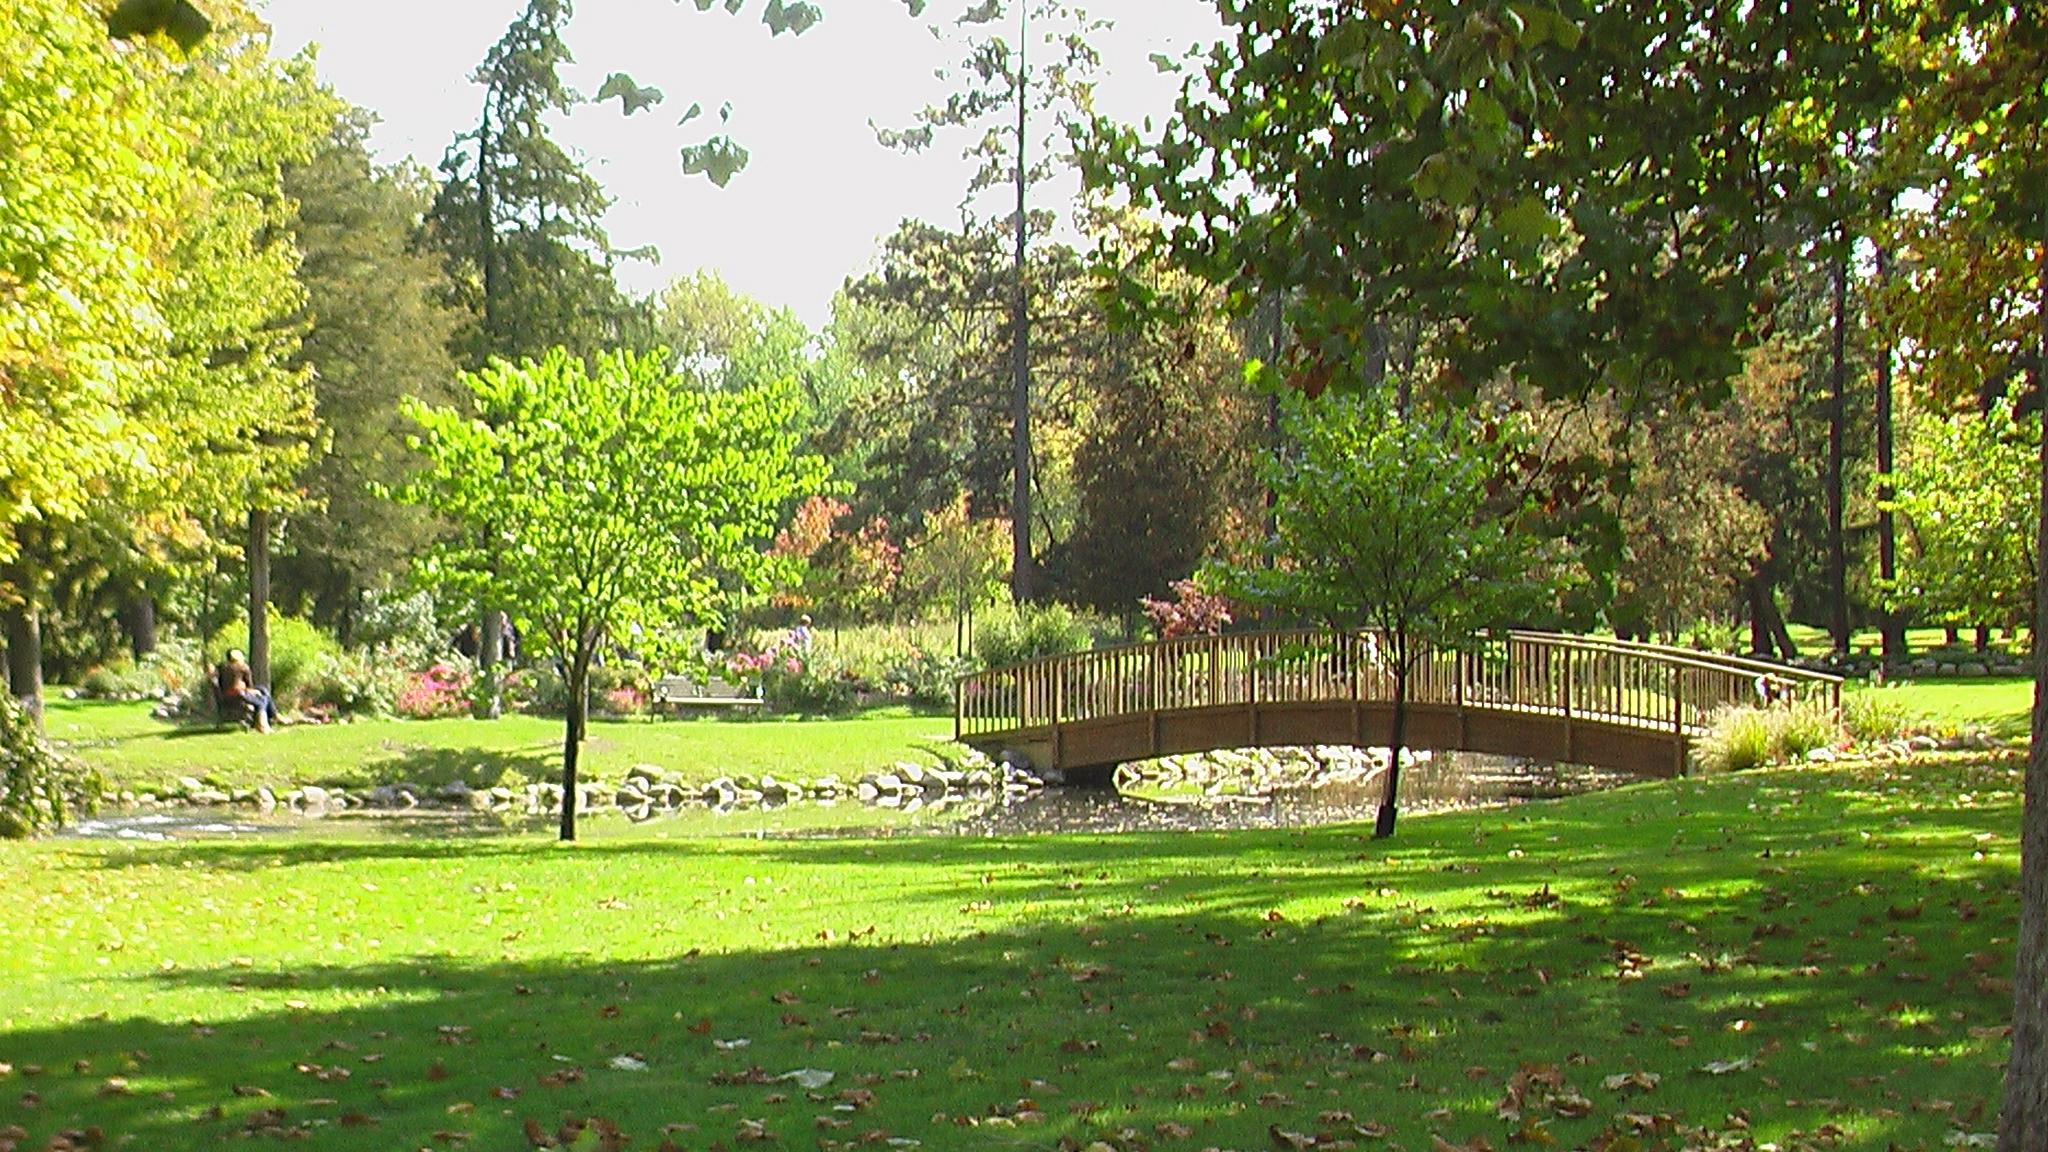 The Resurrection of Mrs. Stock's Park